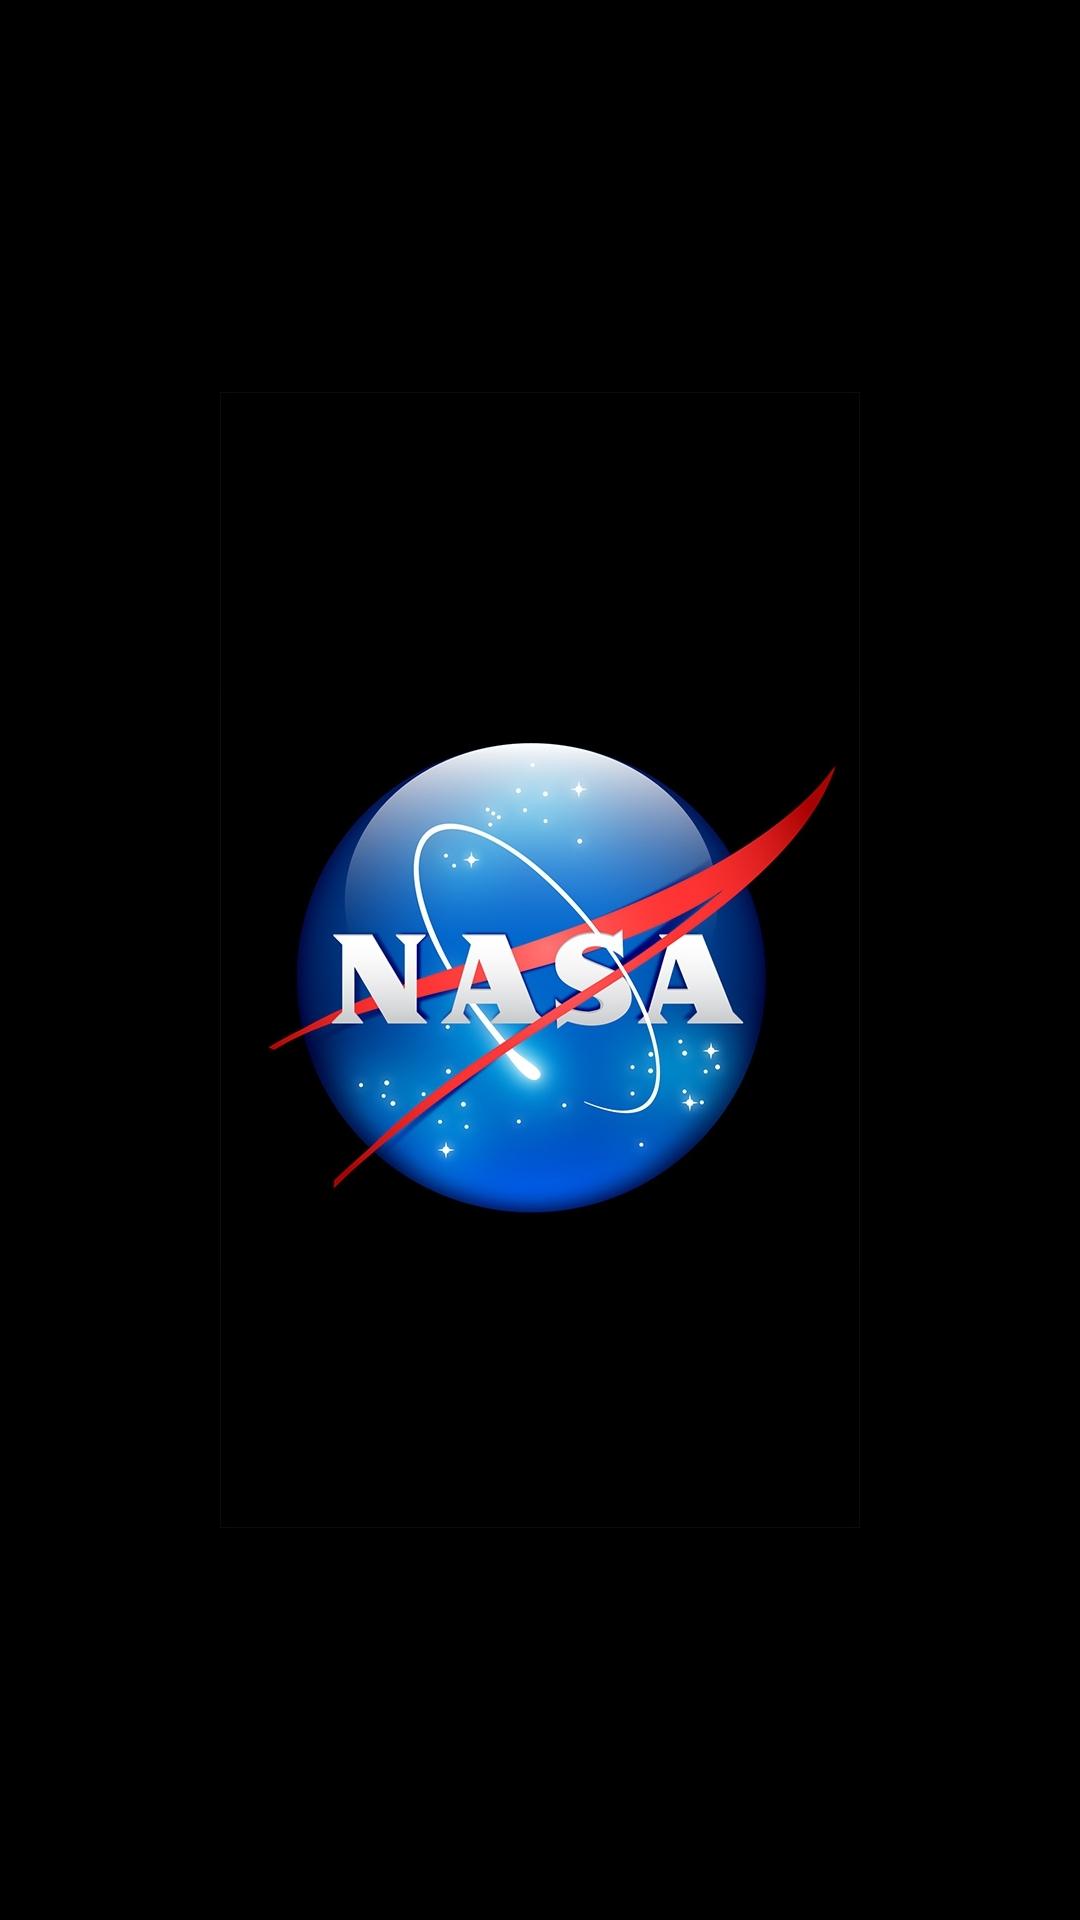 Nasa Logo Wallpaper wwwgalleryhipcom   The Hippest Pics 1080x1920